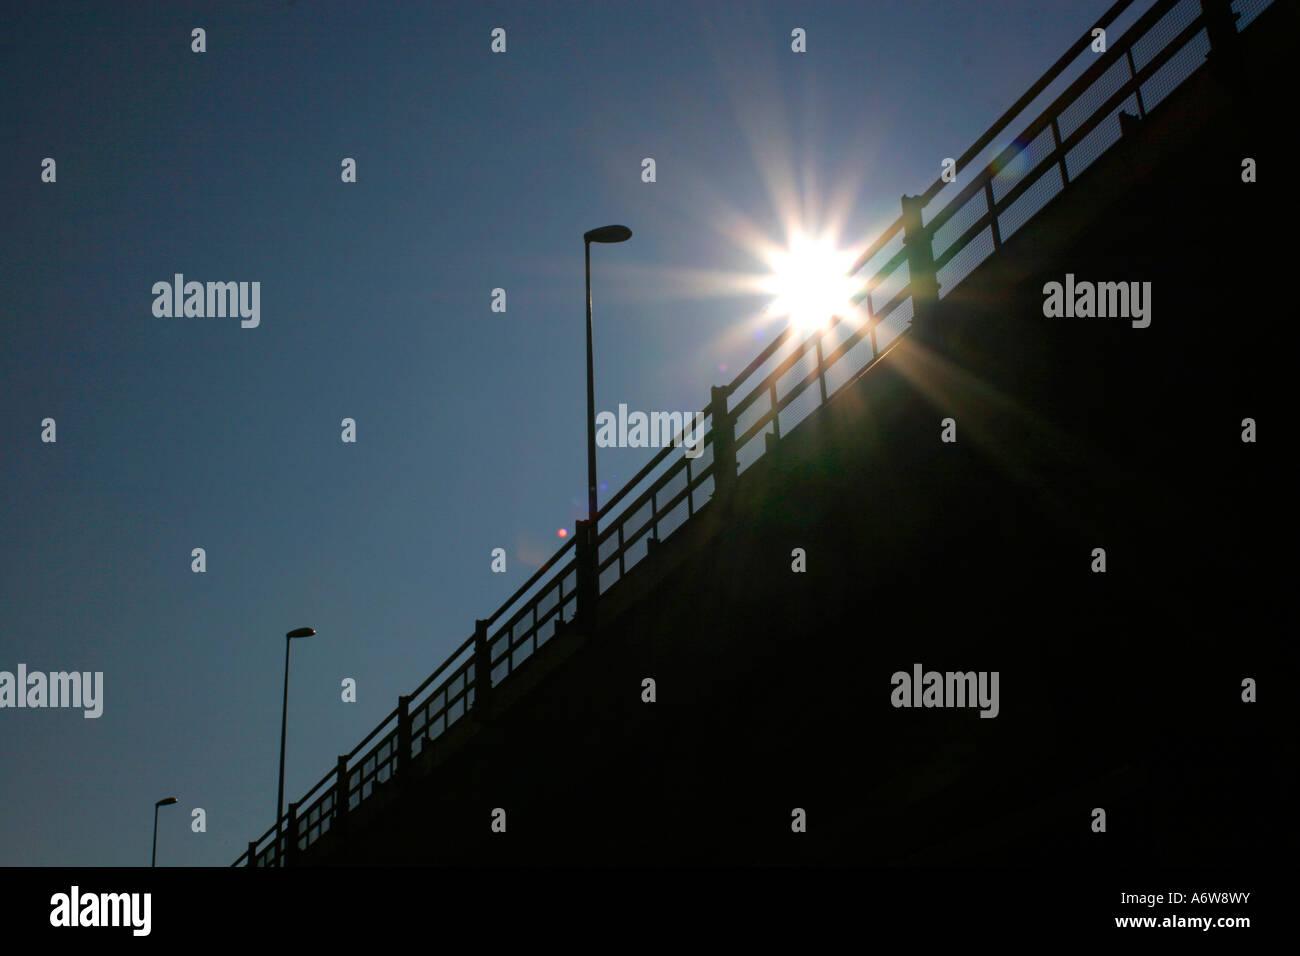 Silhouette of a bridge with a stellar sun - Stock Image